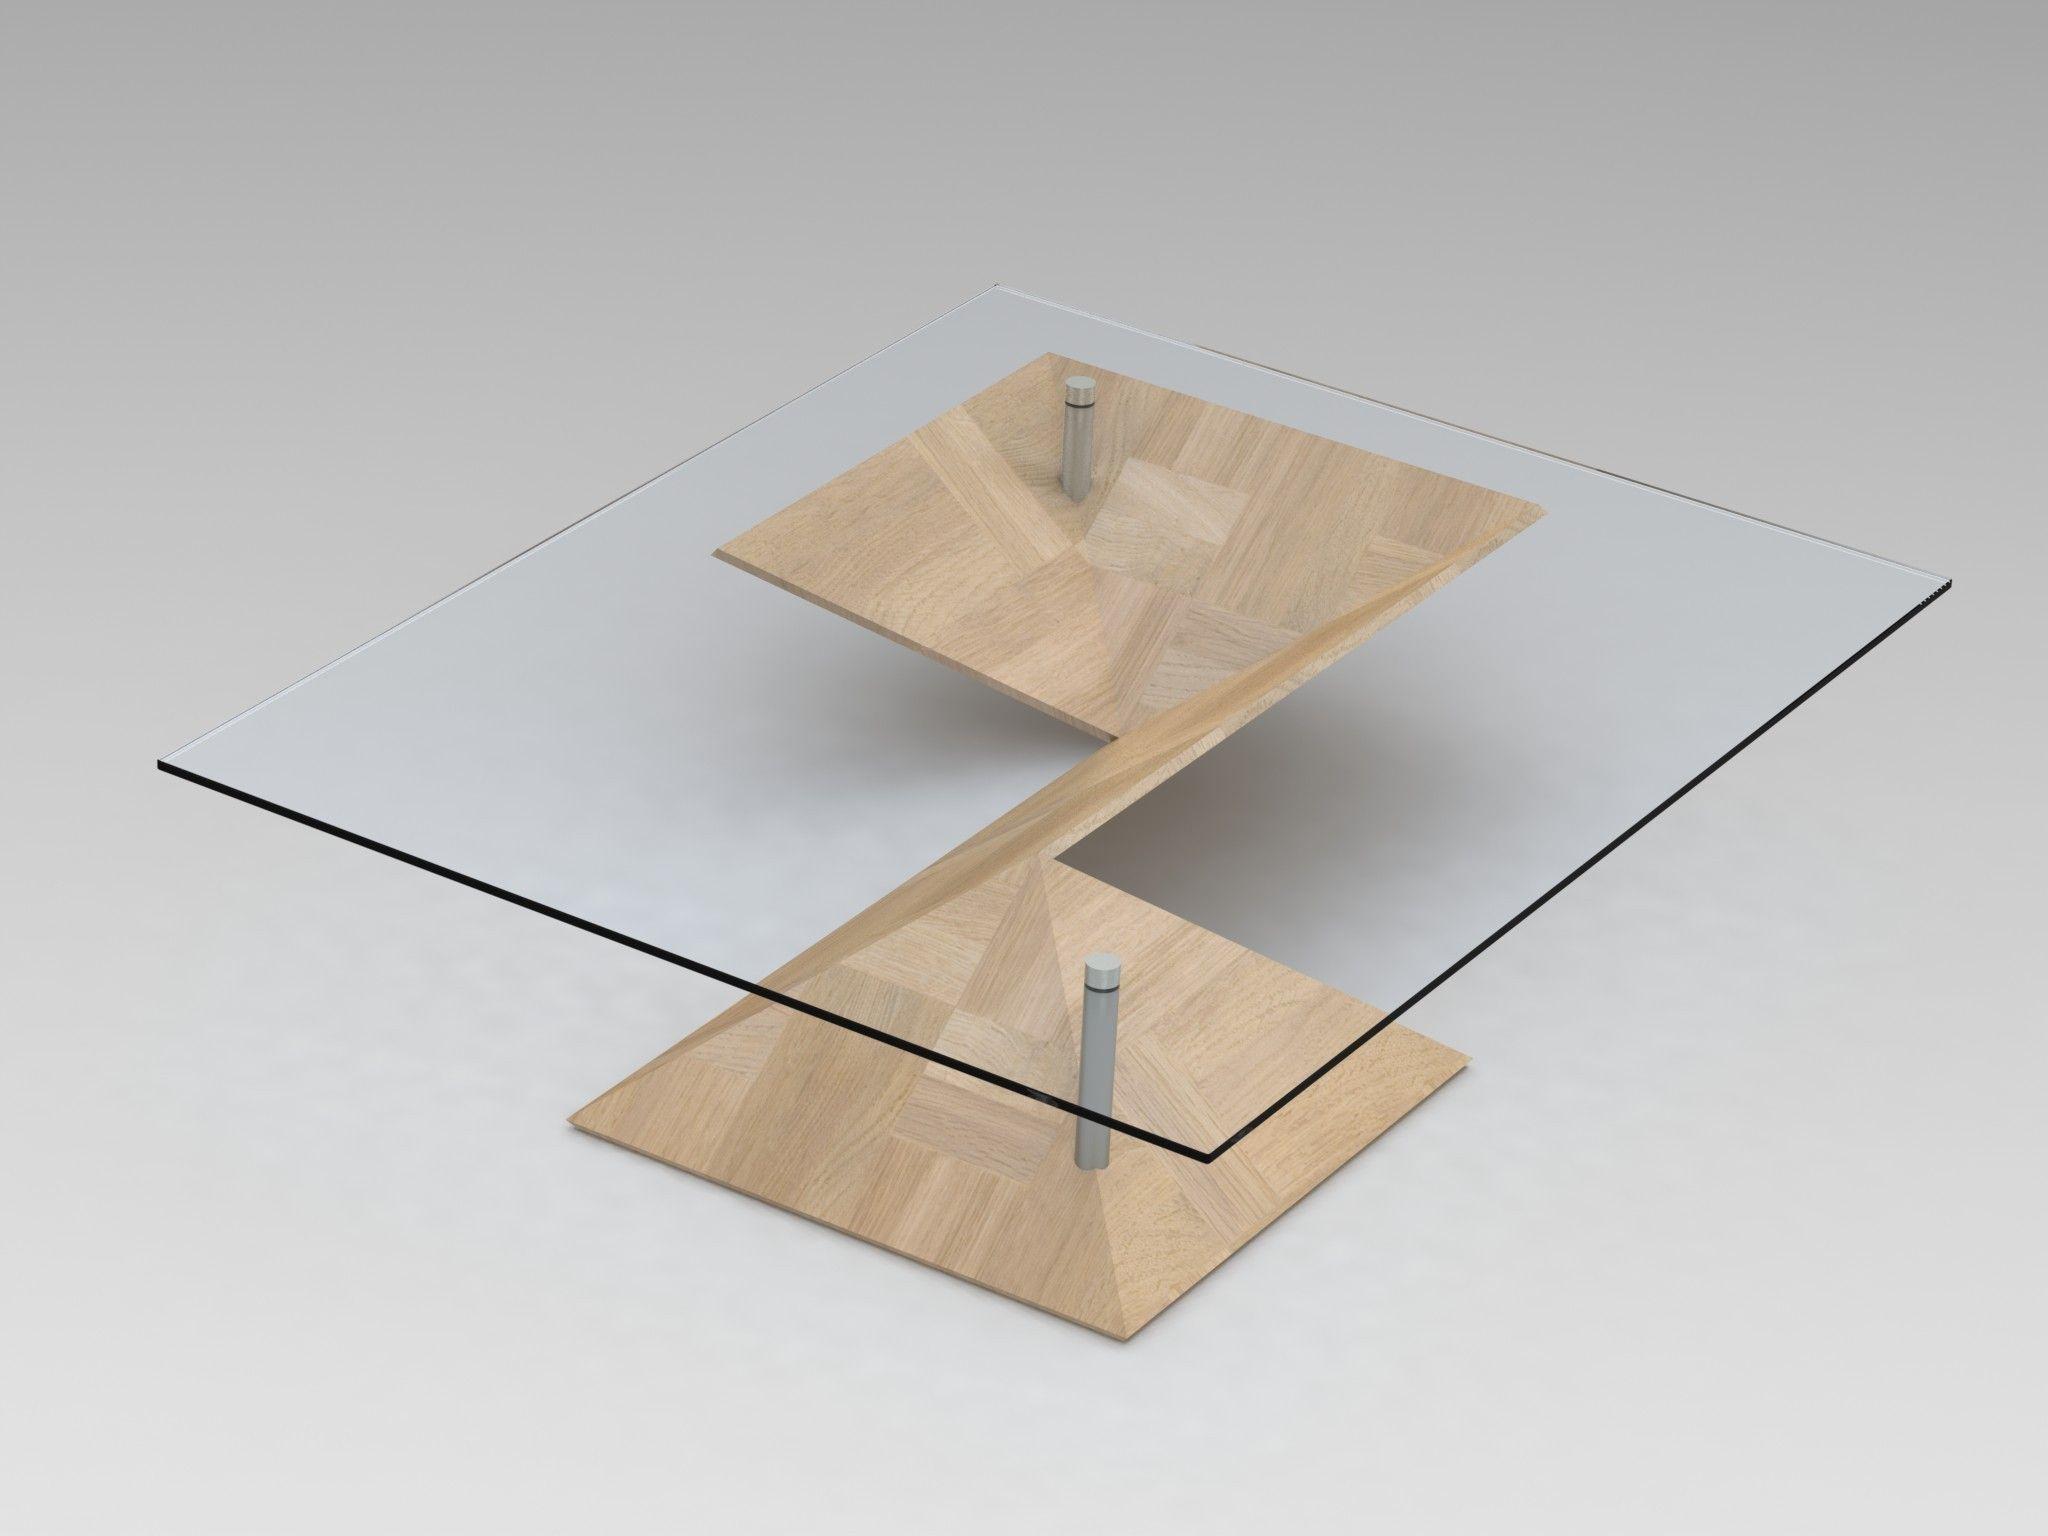 ... Origami Coffee Table 3d Model Sldprt Sldasm Slddrw Ige Igs Iges 2 ...